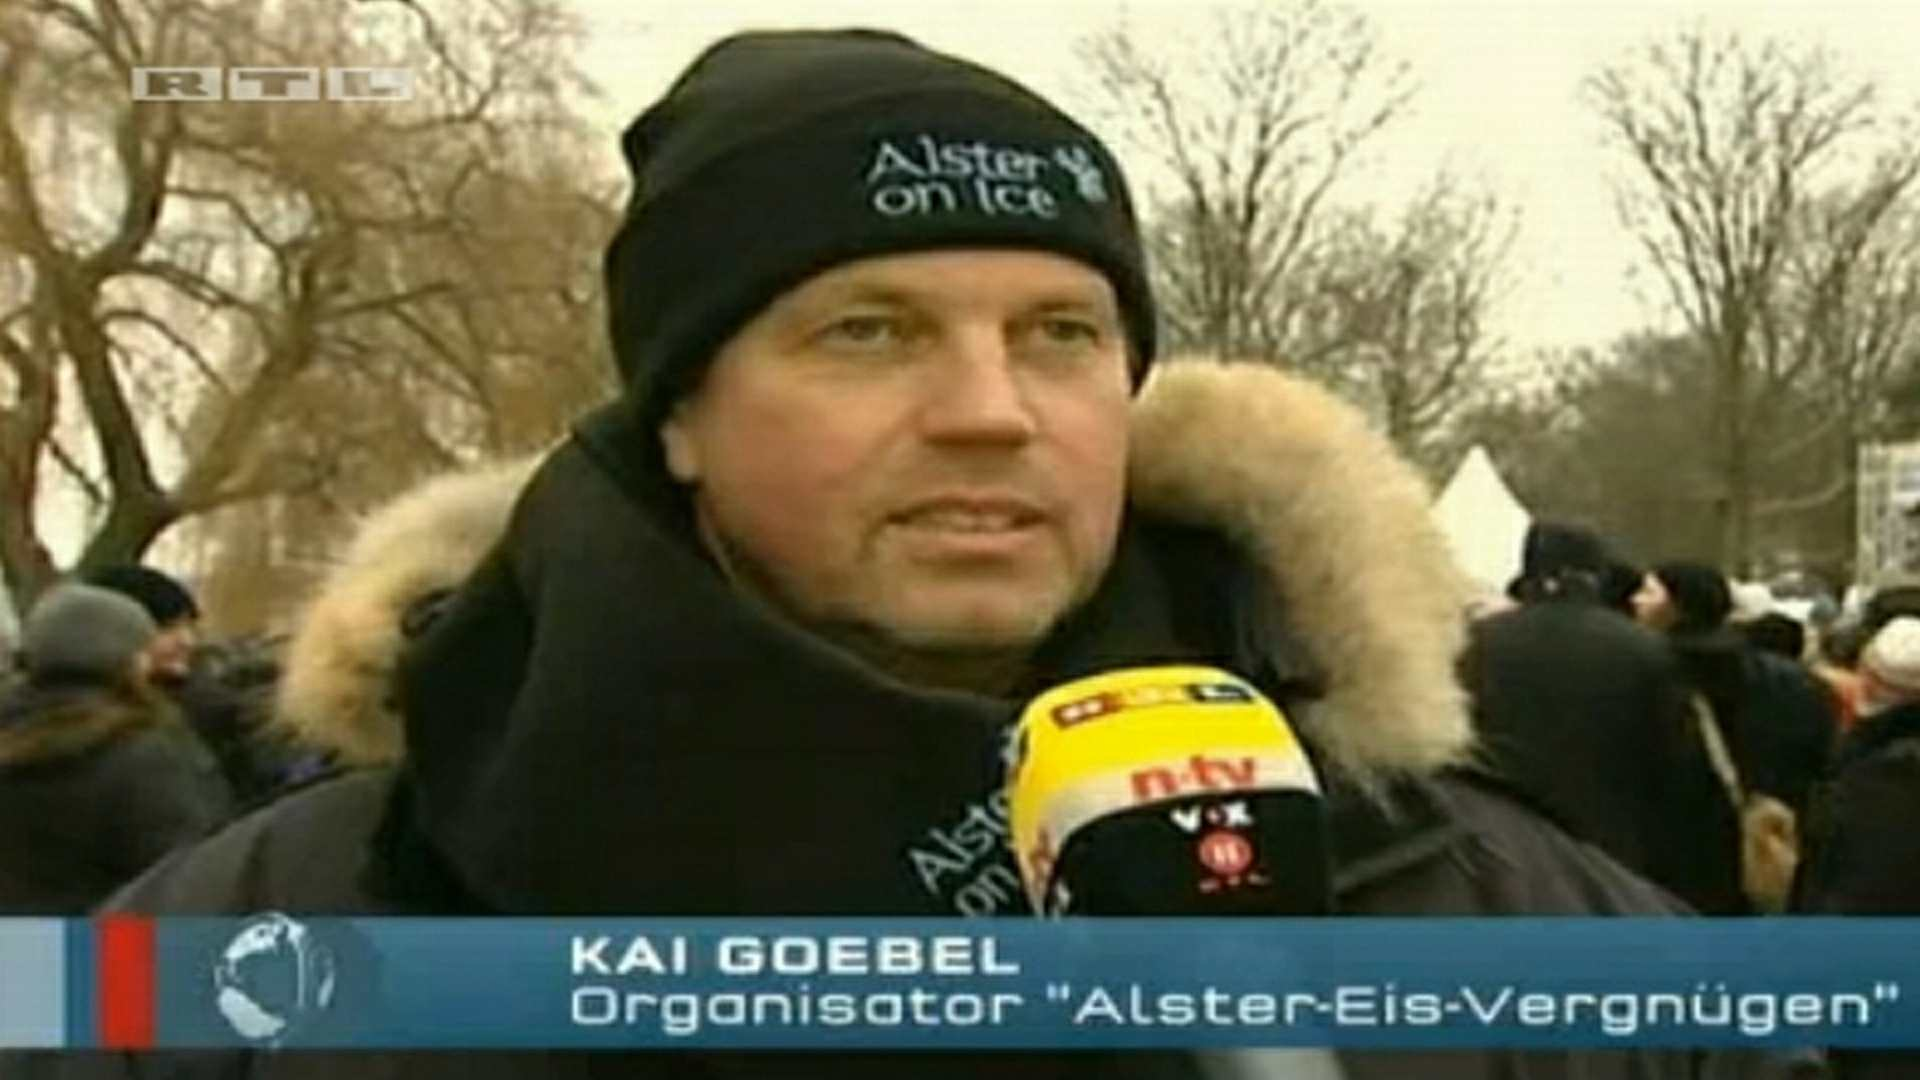 RTL Alster on Ice 2012 - Großveranstaltung